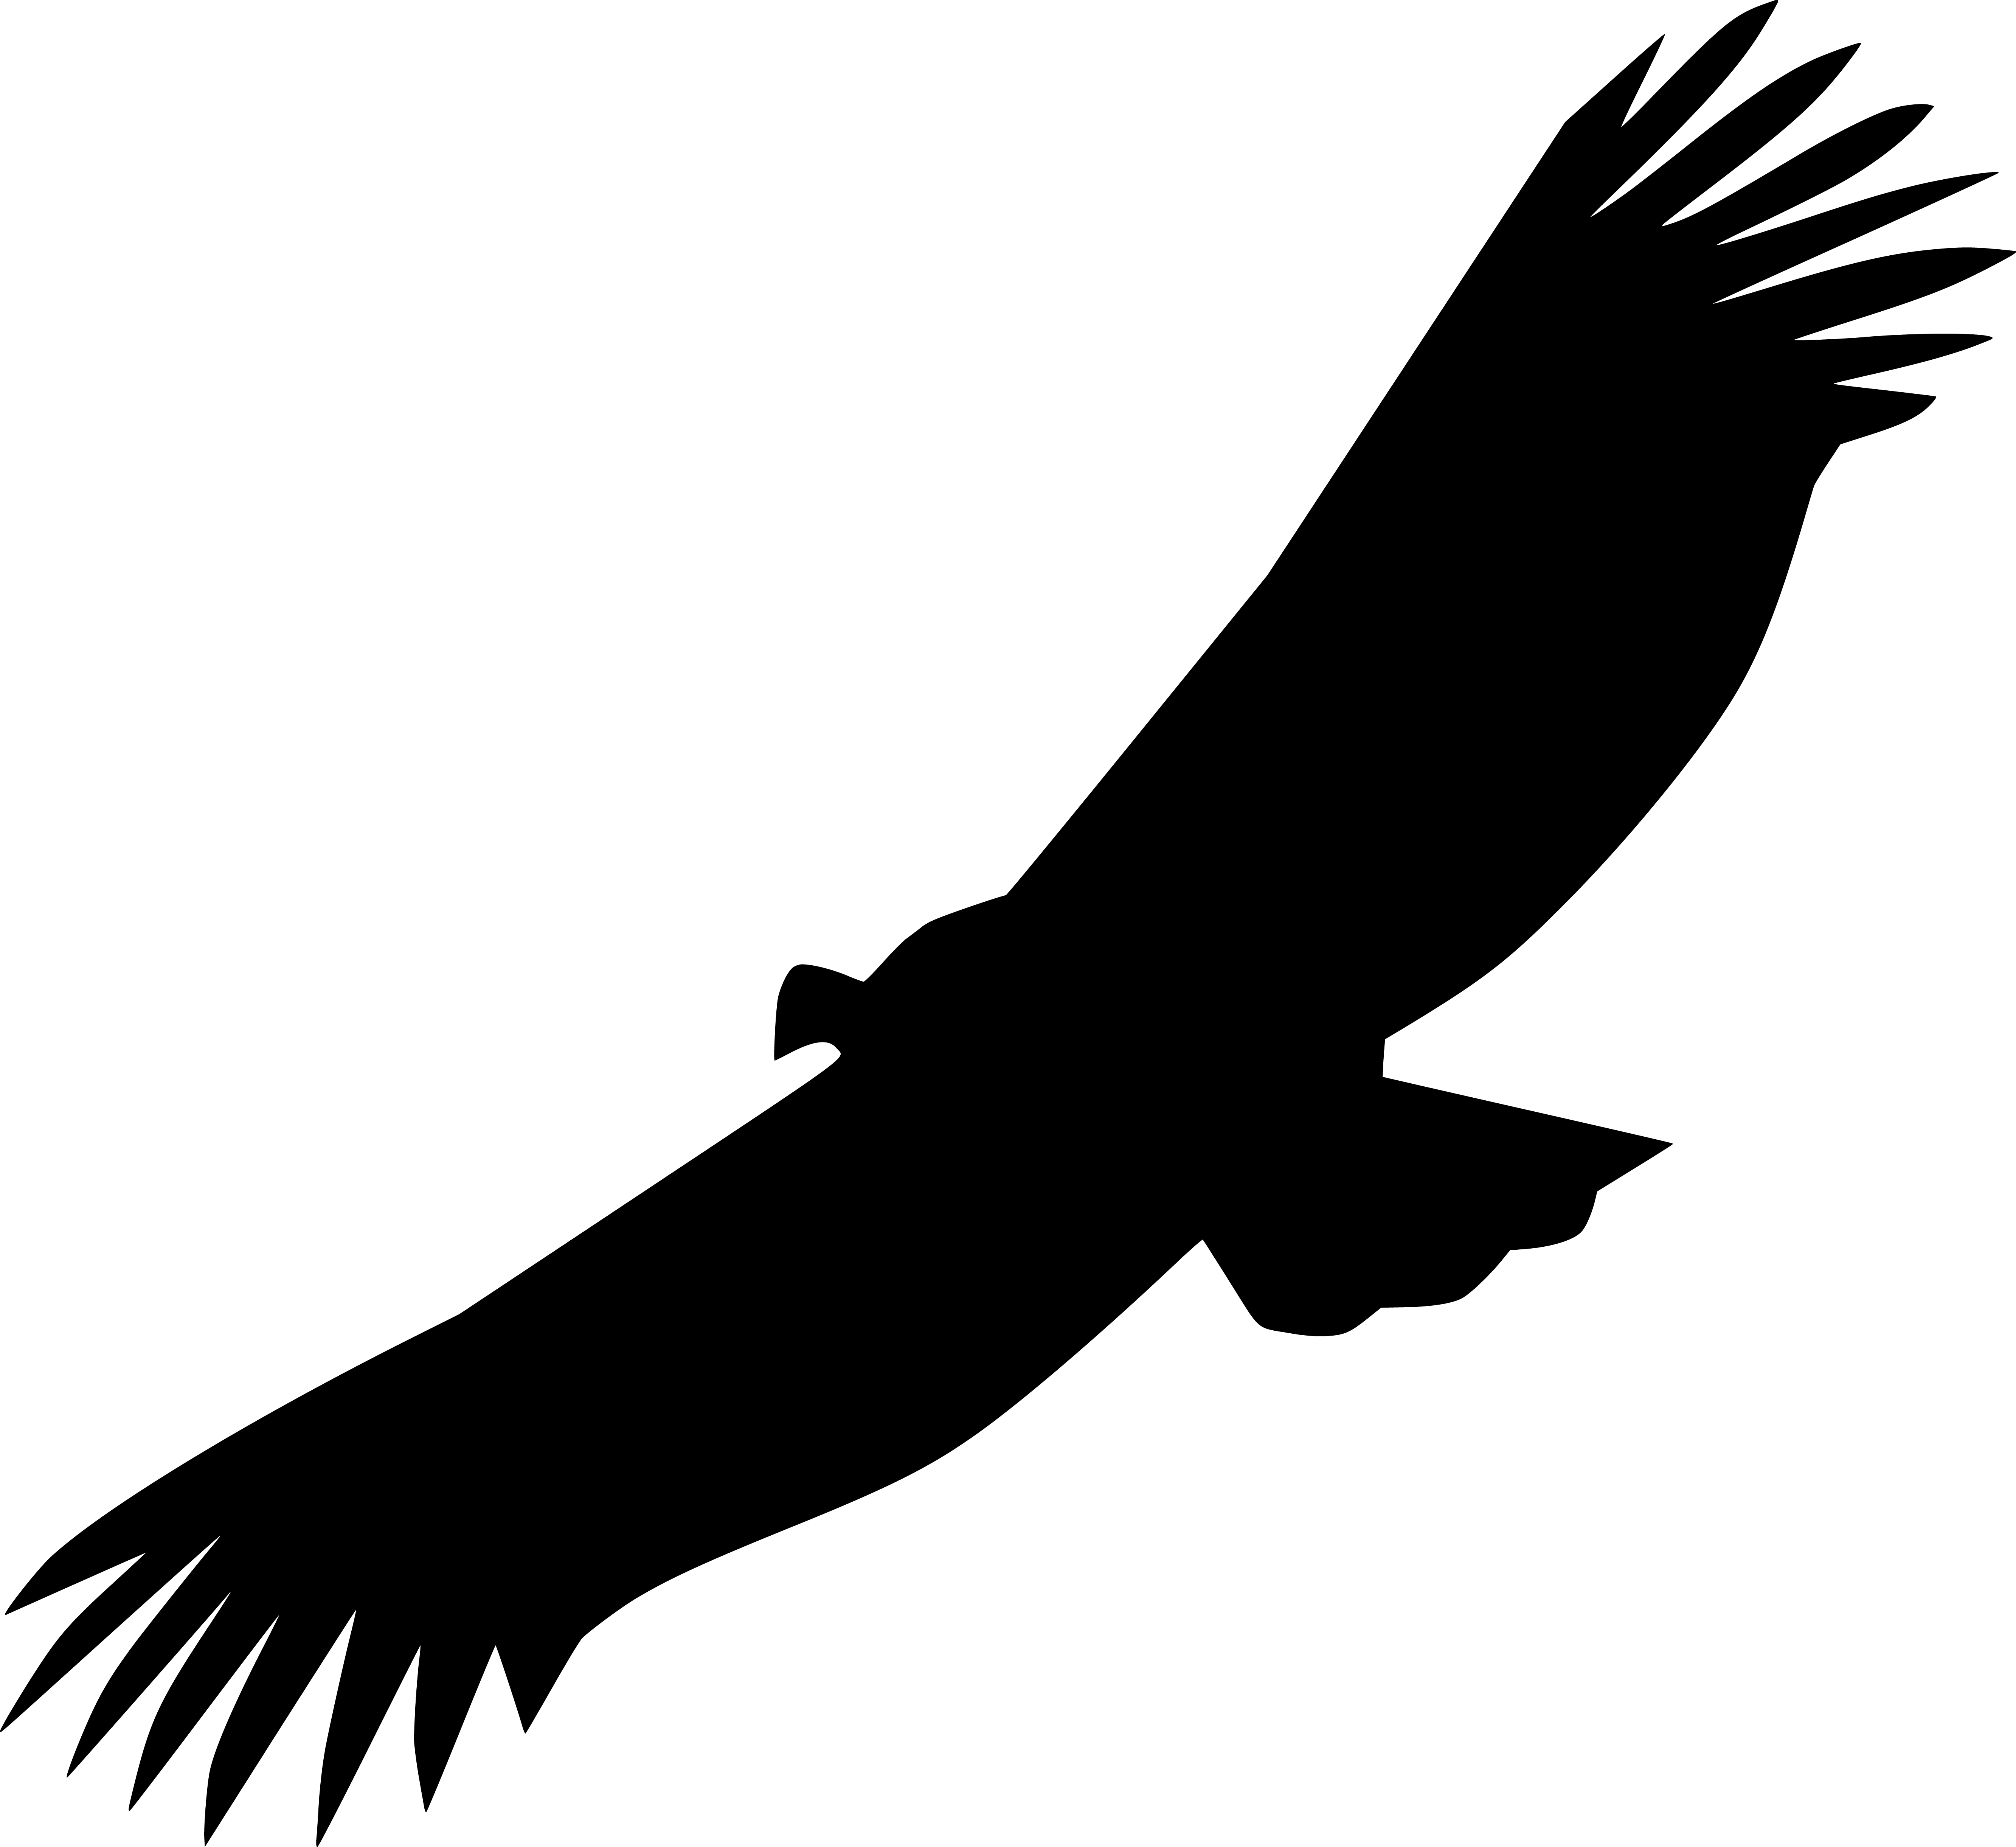 vautour gorges du tarn icone